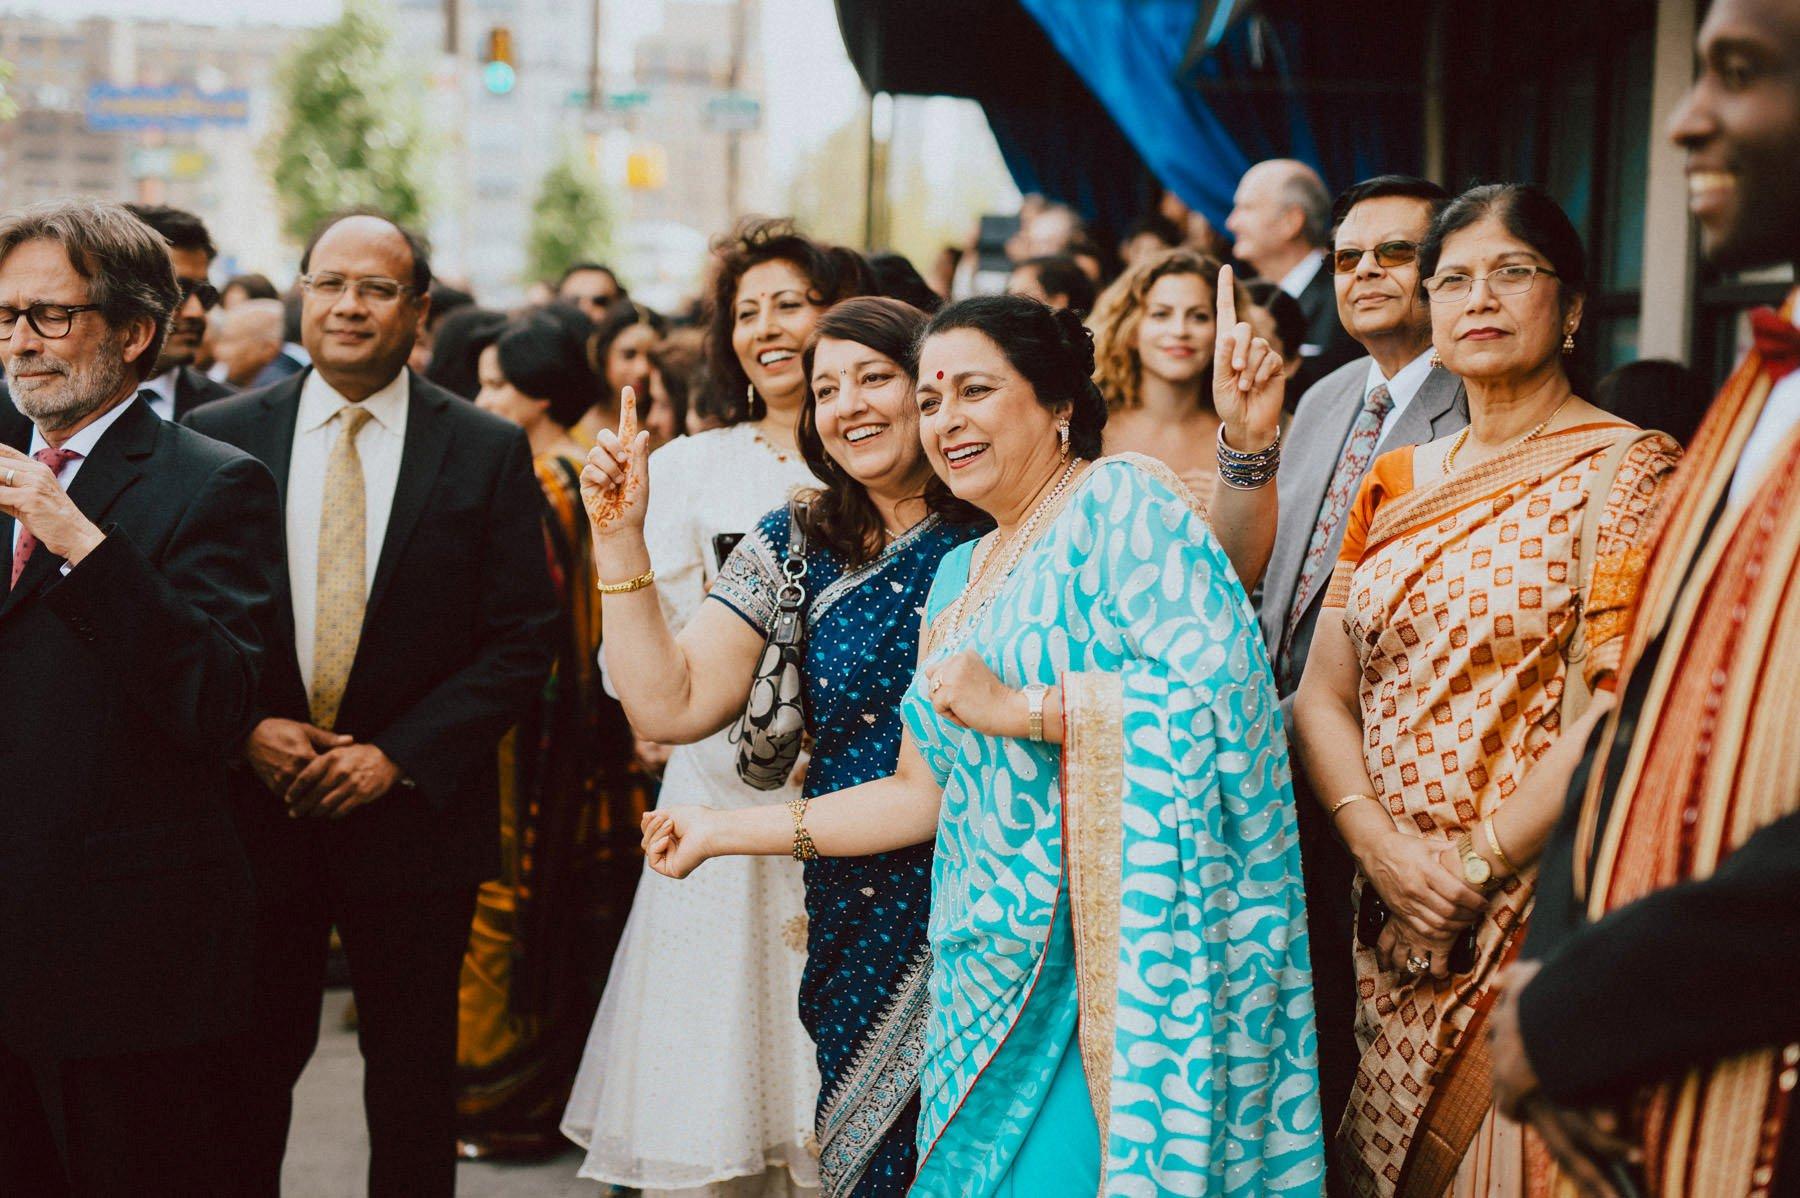 vie-philadelphia-indian-wedding-50.jpg